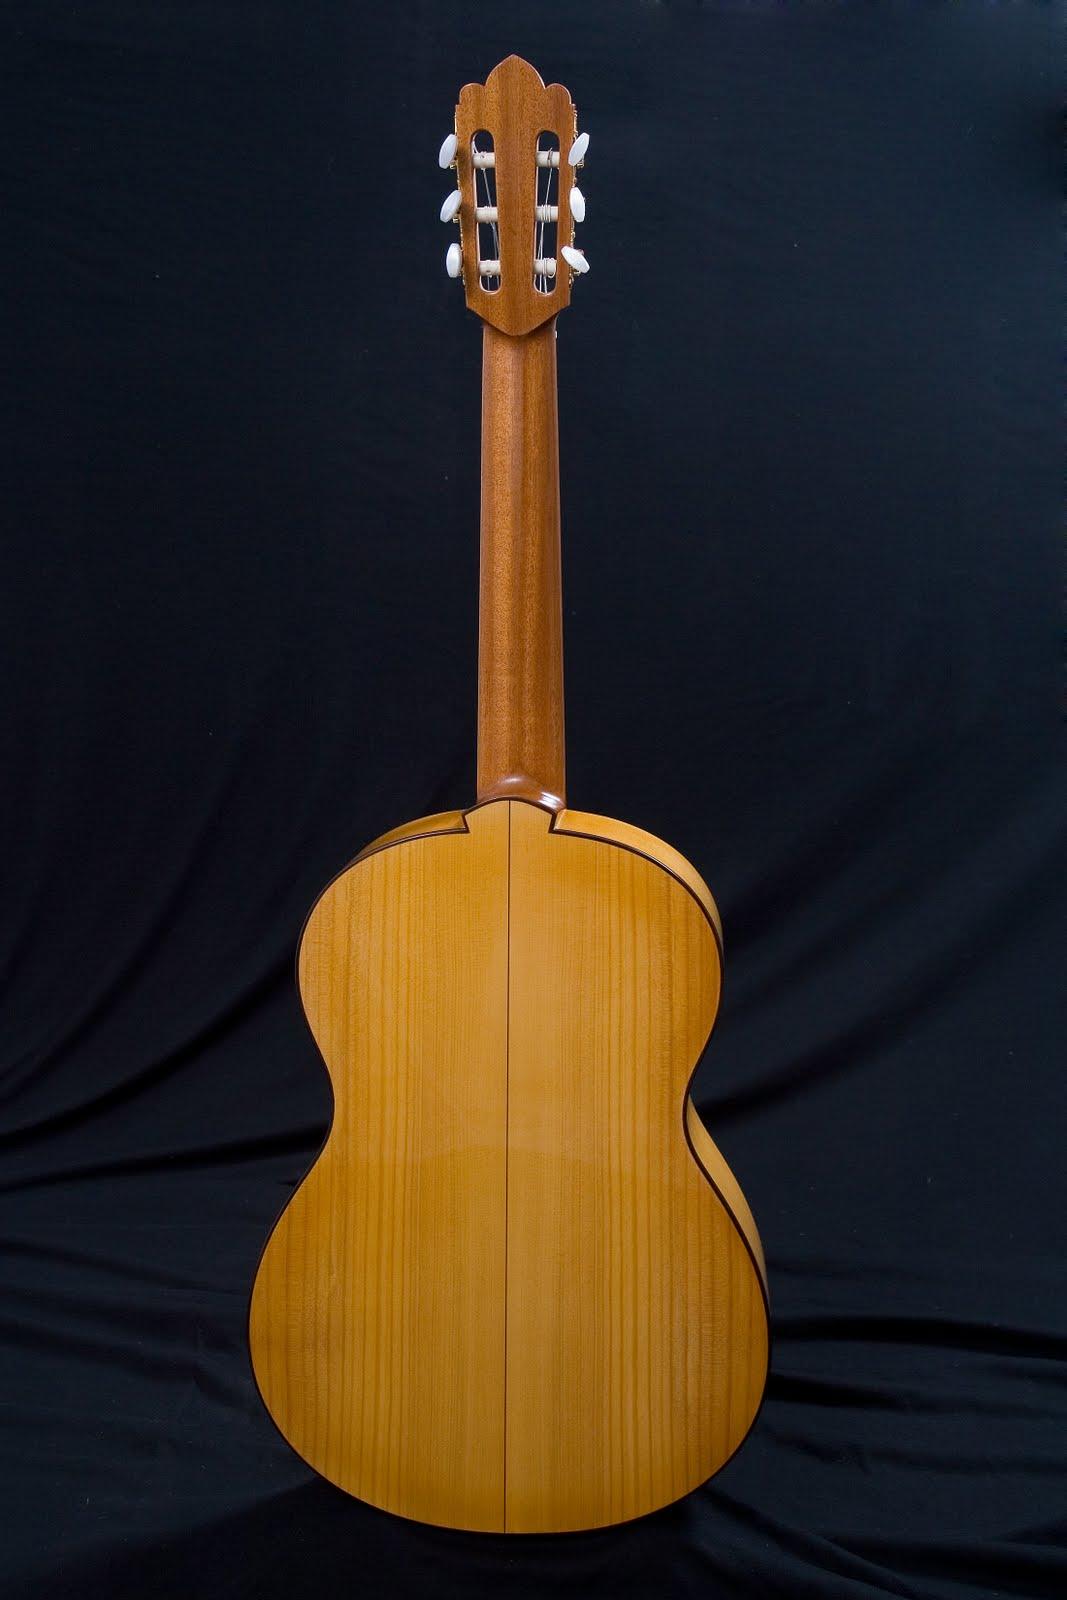 guitarras custom constru das por rodolfo cucculelli luthier cypress guitar scale 650 mm. Black Bedroom Furniture Sets. Home Design Ideas